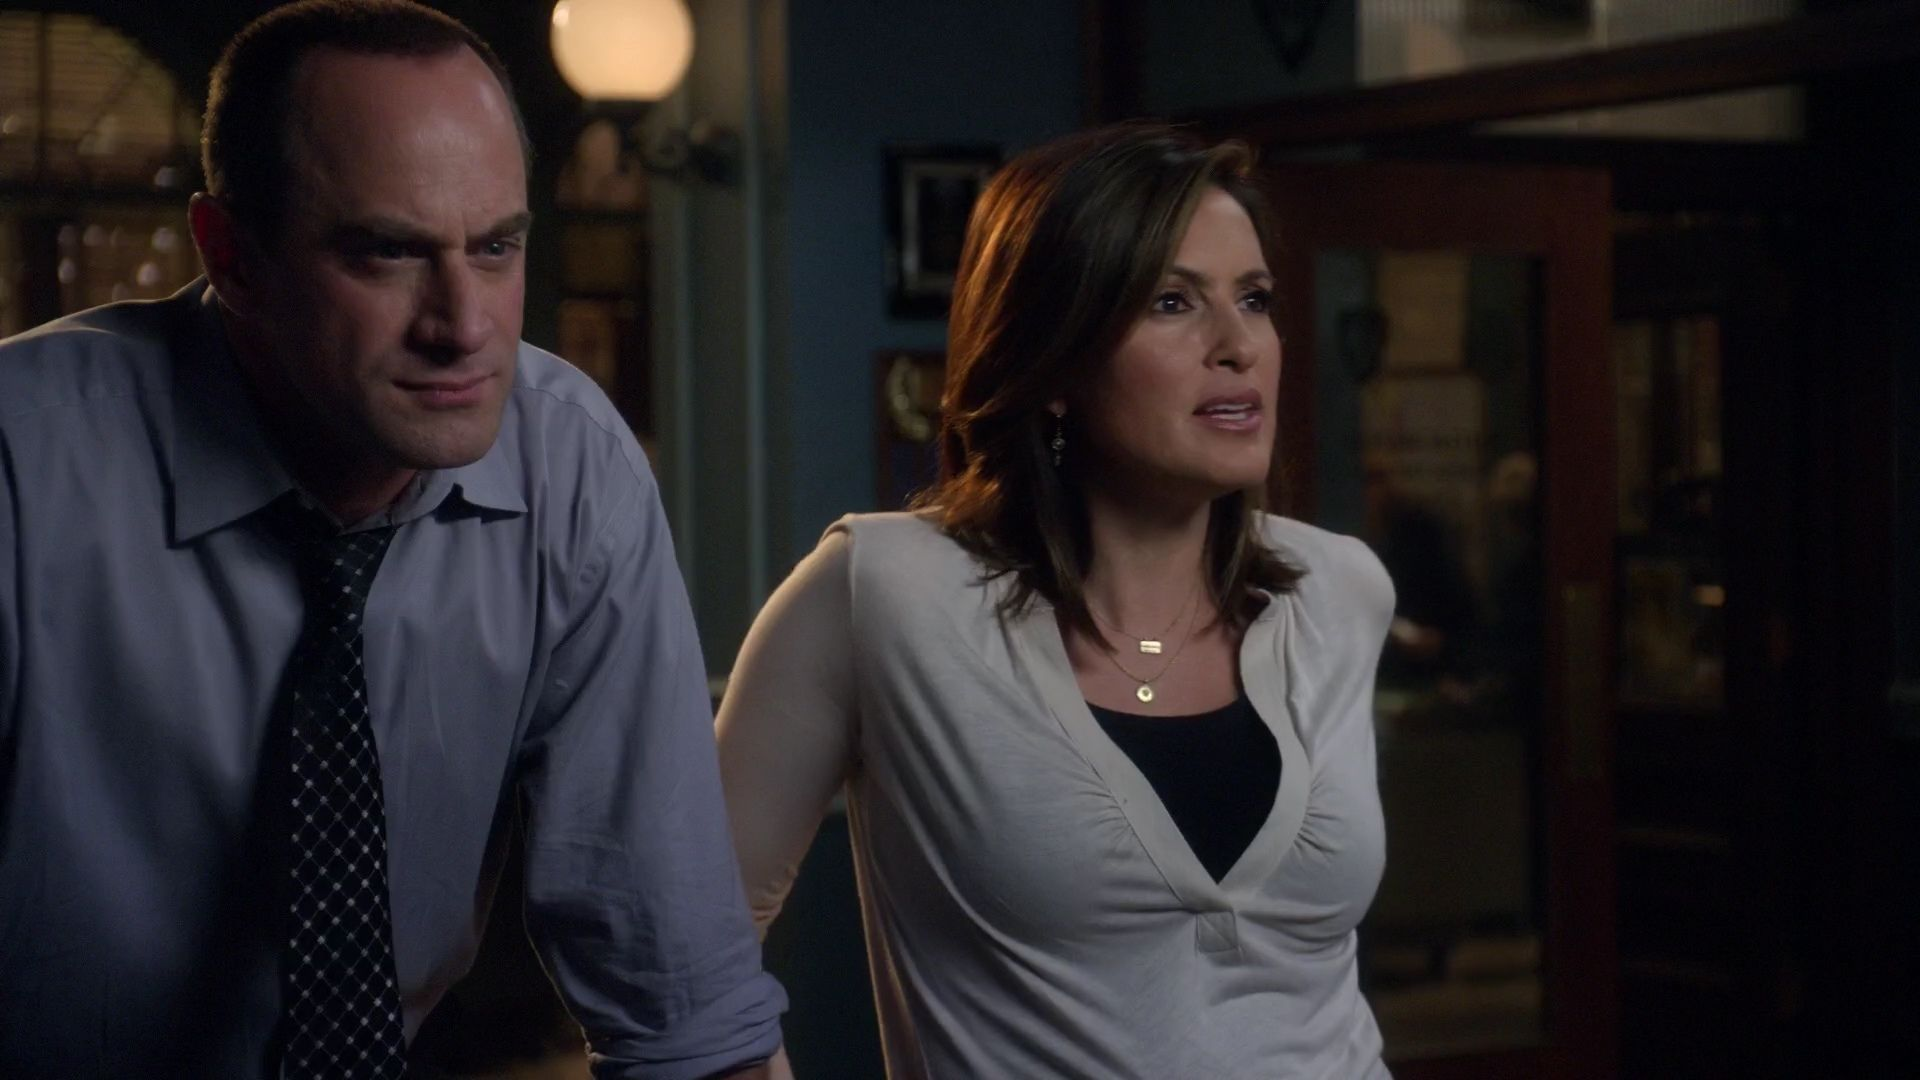 Detective Elliot Stabler Olivia Benson Law And Order Svu Law And Order Benson And Stabler